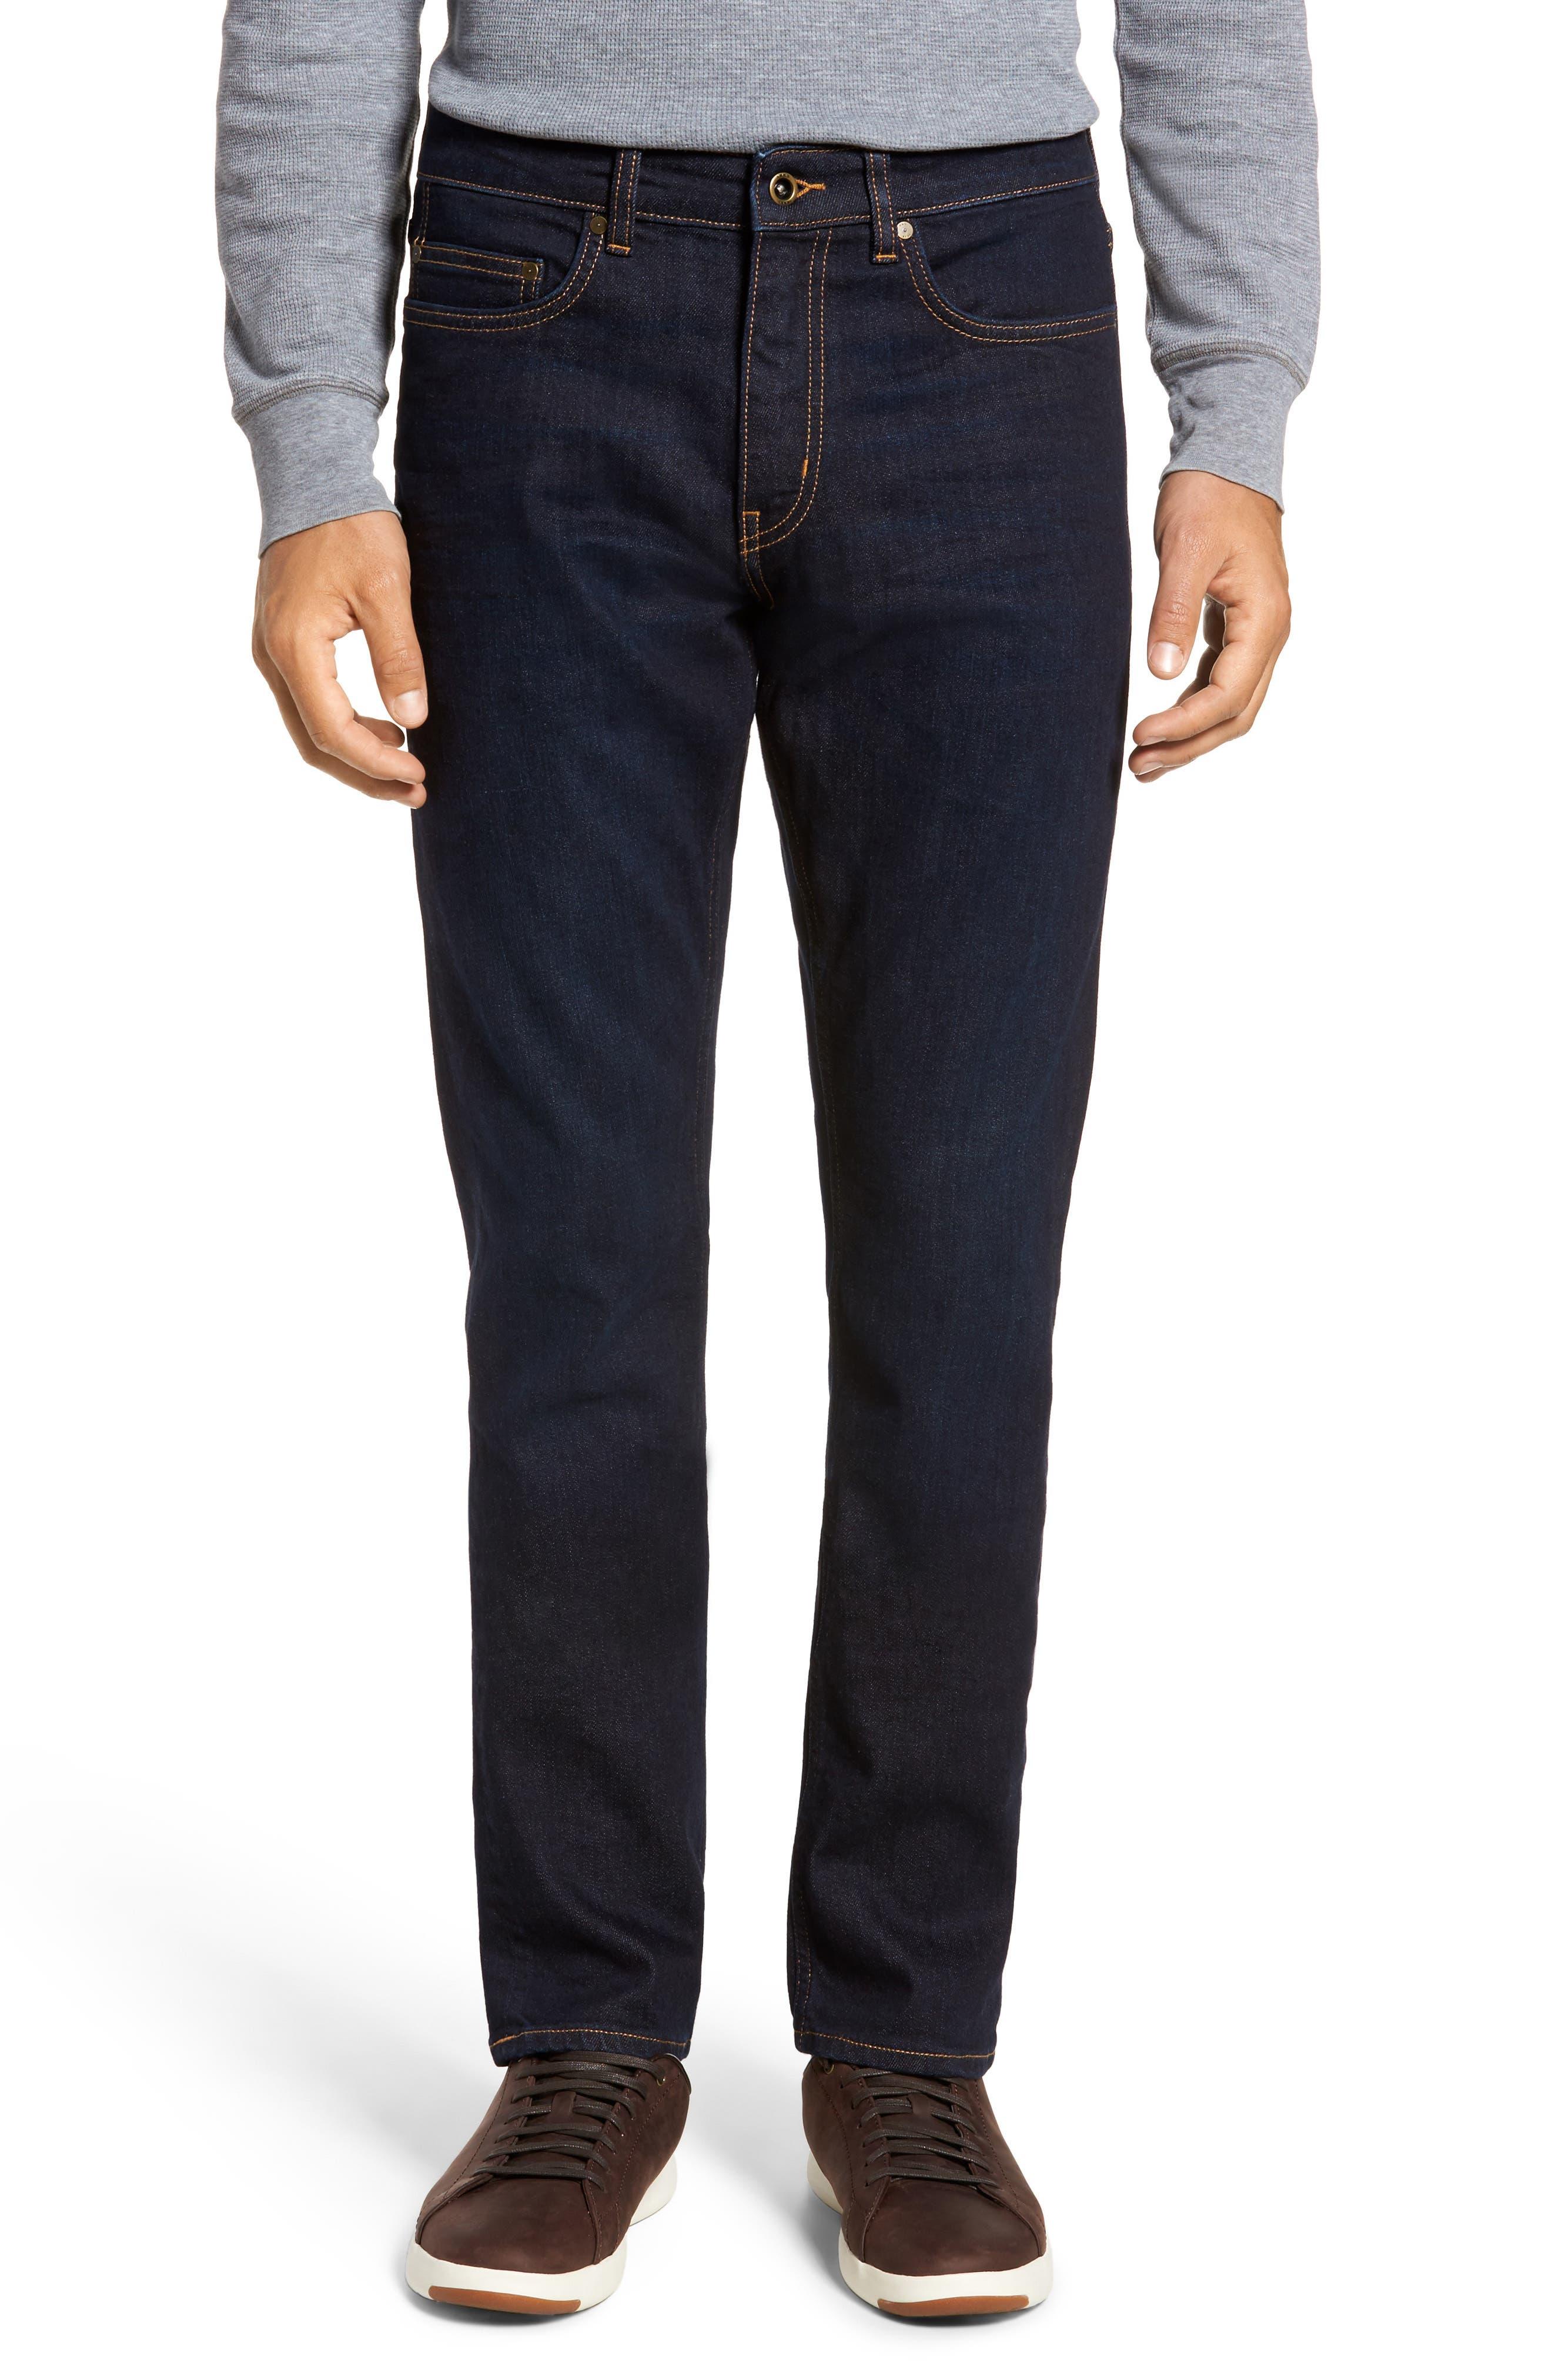 Fanshawe Straight Leg Jeans,                         Main,                         color, Denim